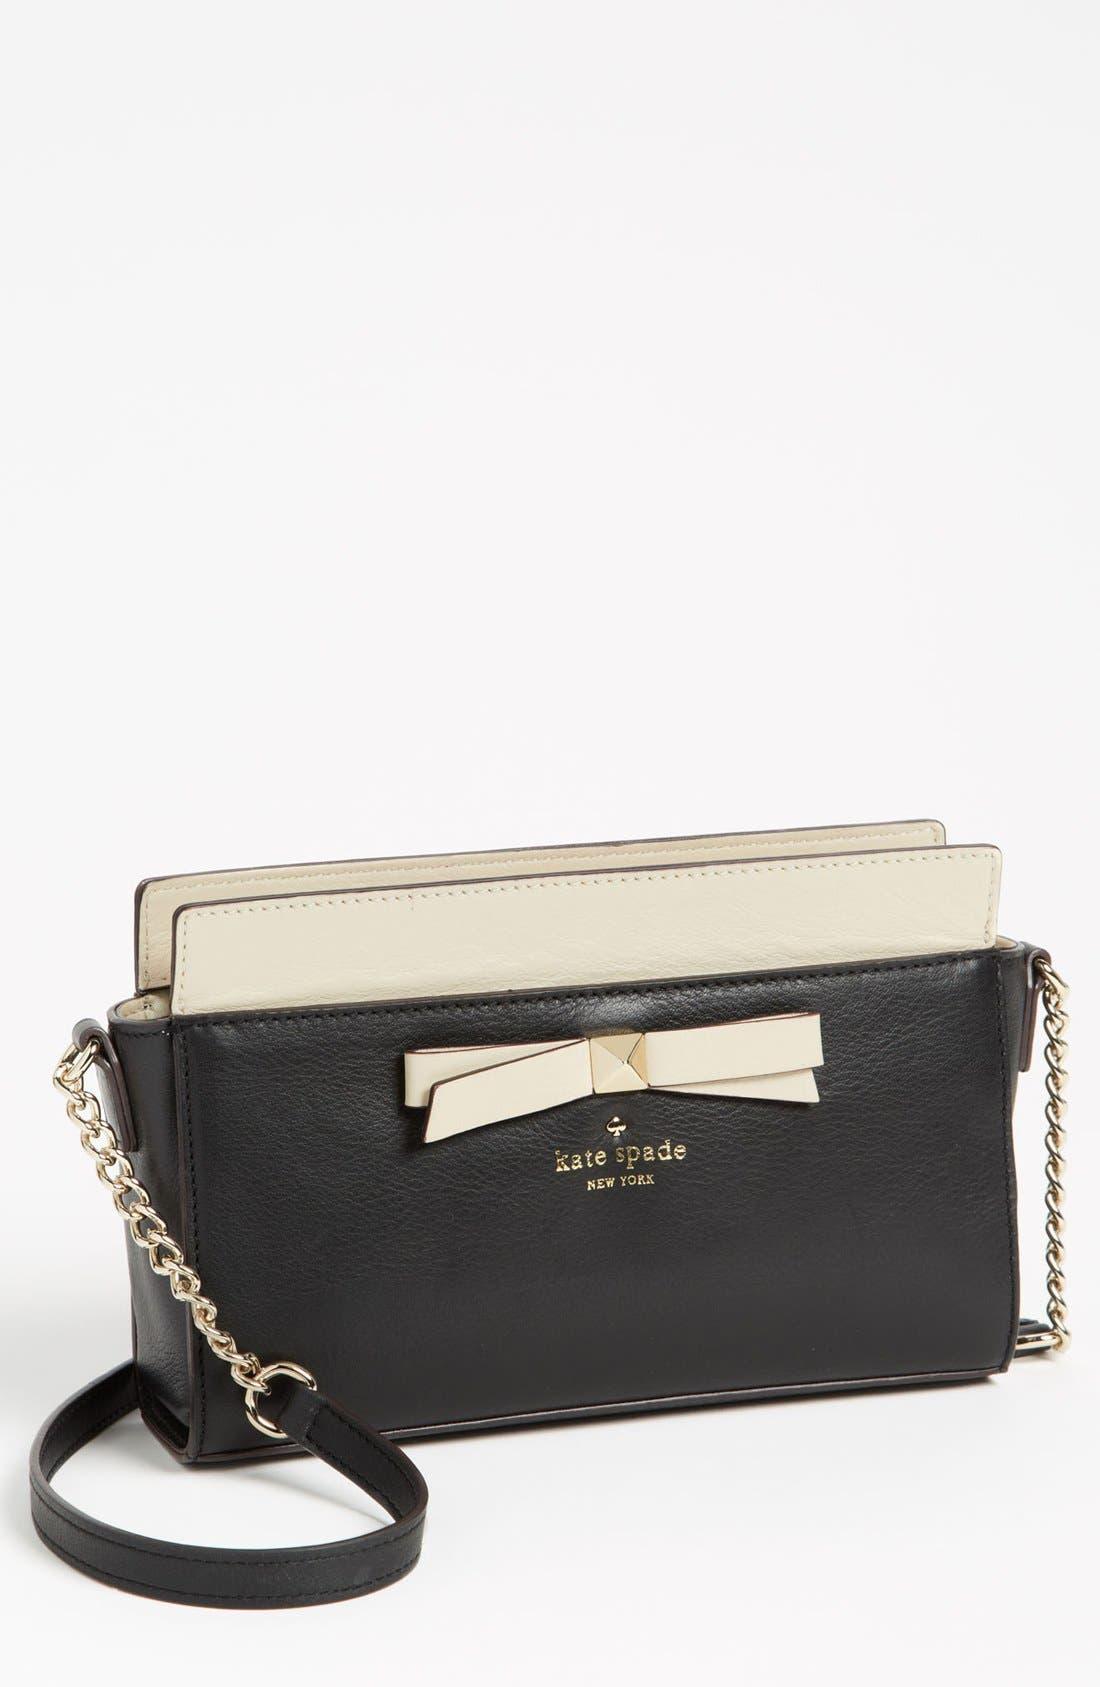 Main Image - kate spade new york 'hancock park - angelica' leather shoulder bag, small